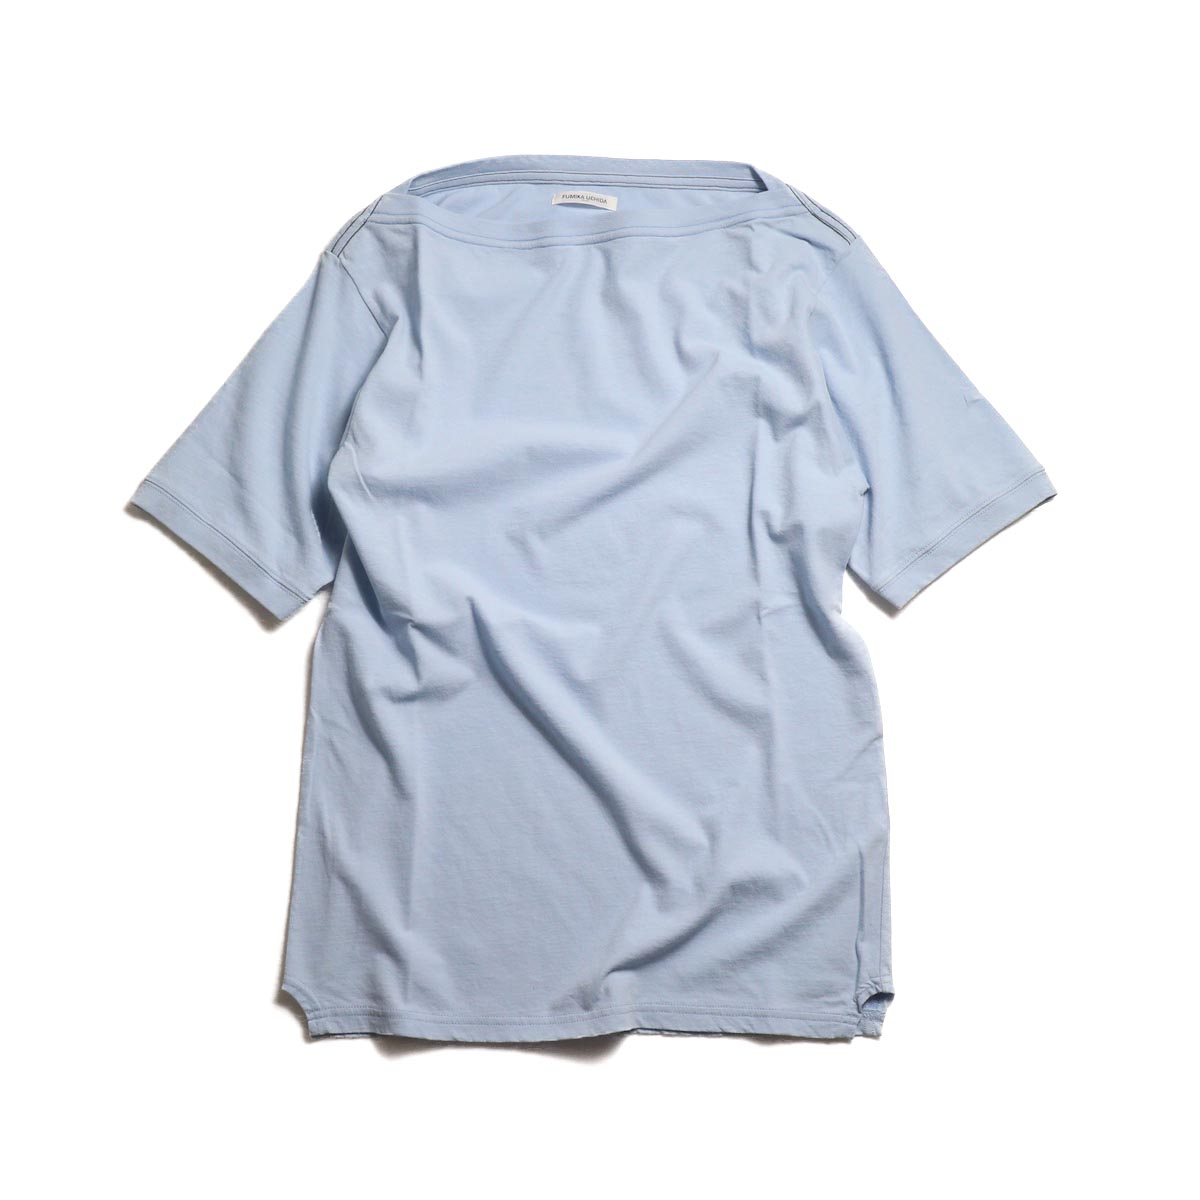 FUMIKA UCHIDA / Cotton Straight Neck Over Shoulder Tee -Sax